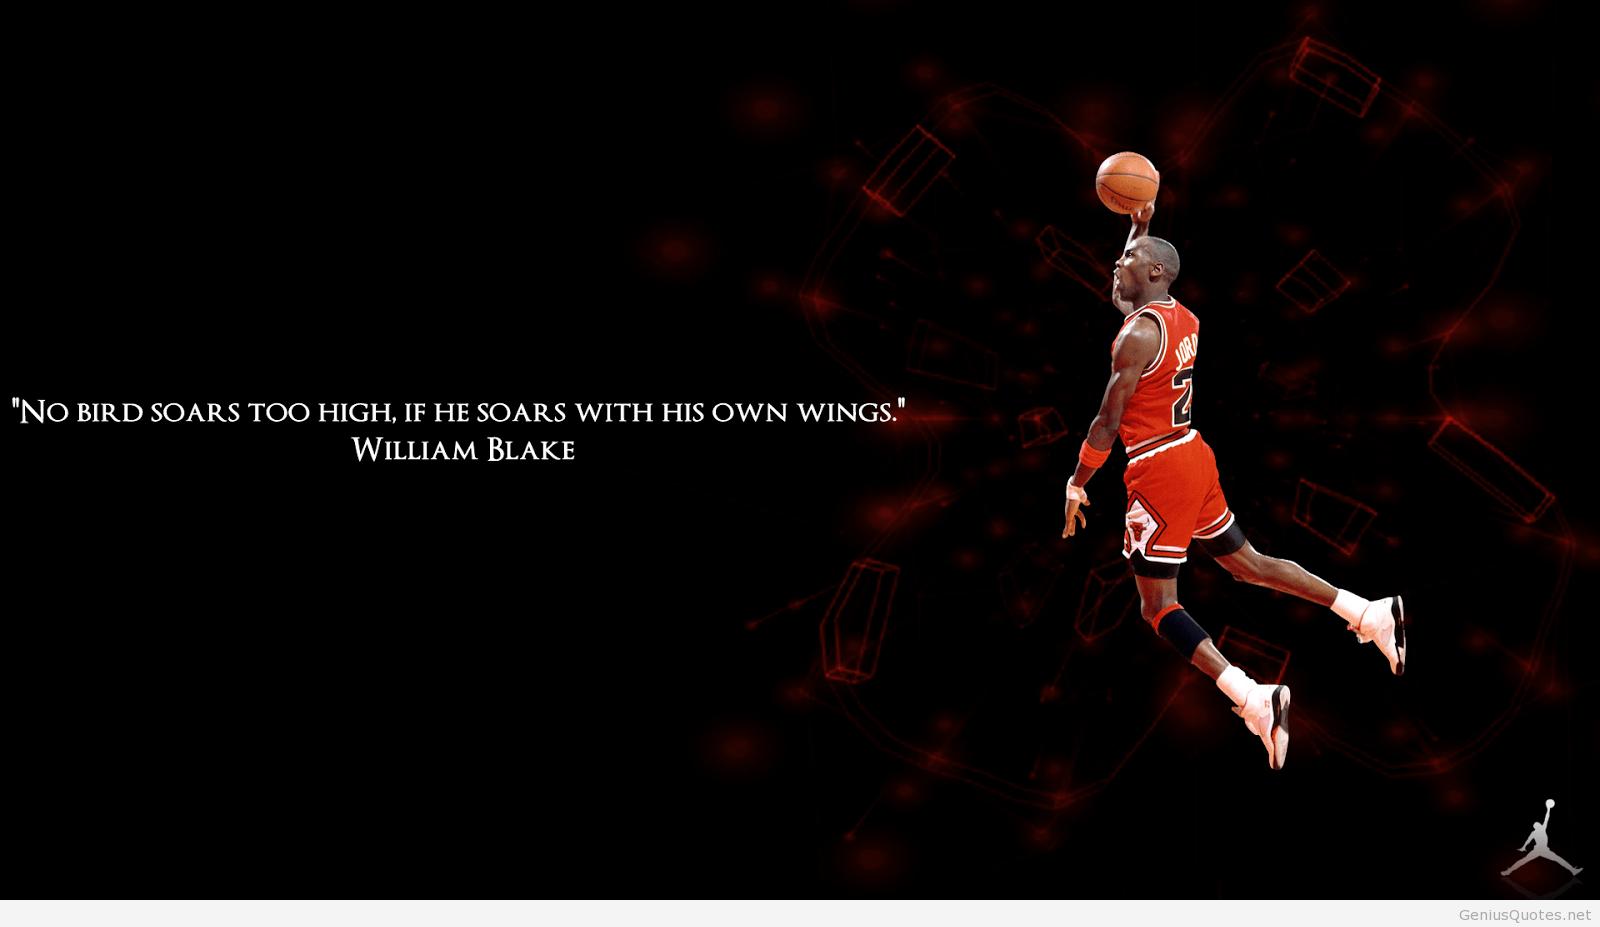 Motivational Wallpaper Quotes Kobe Michael Jordan Quote Wallpapers Wallpaper Cave